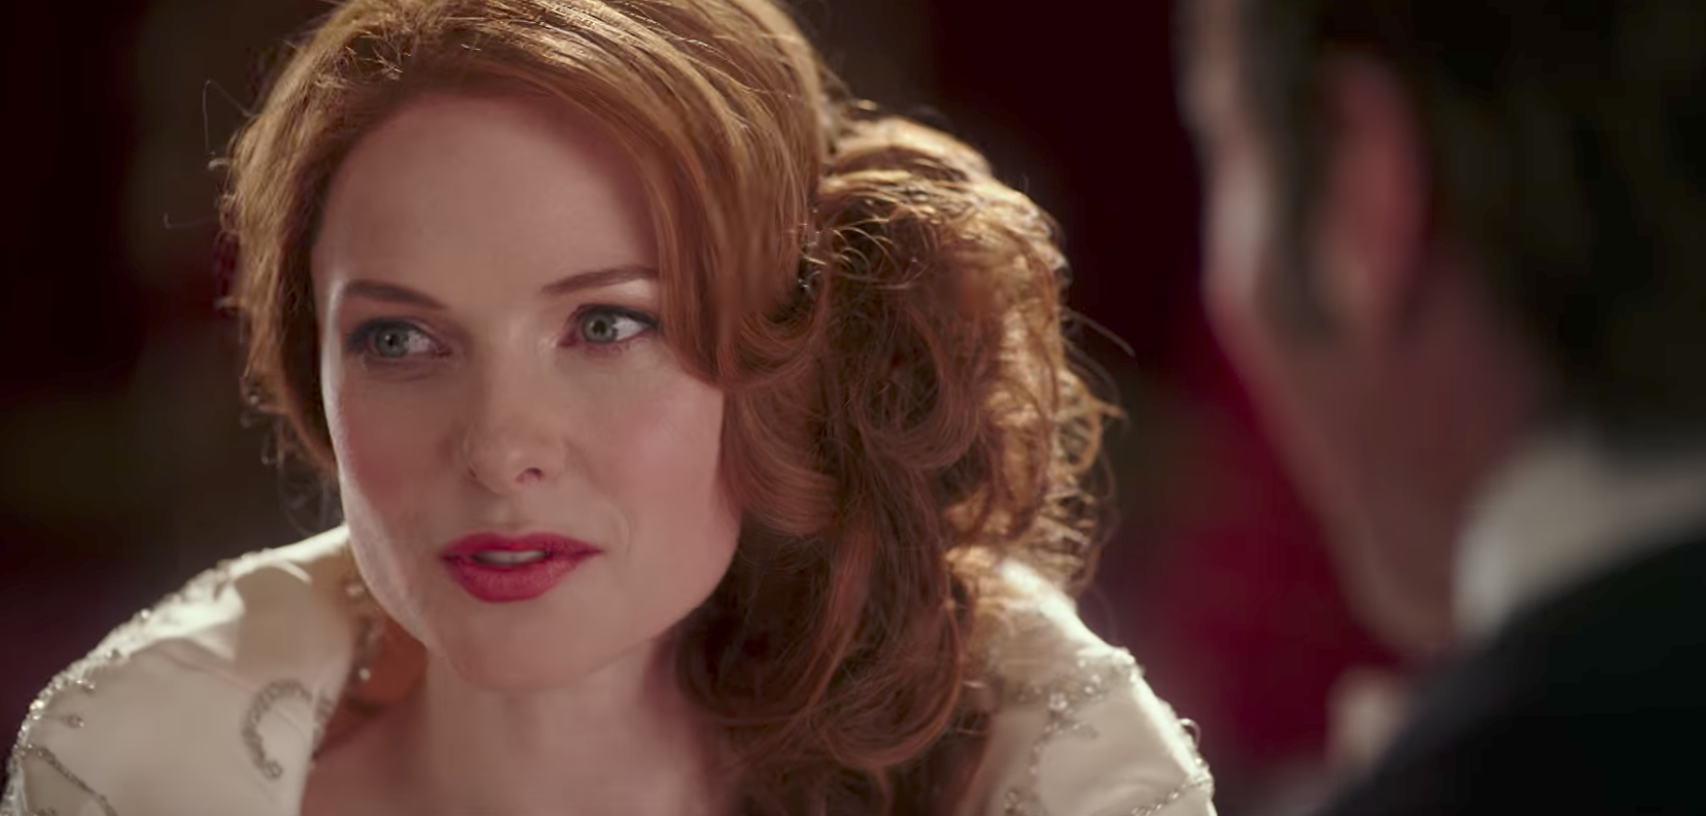 Upcoming Rebecca Ferguson New Movies / TV Shows (2019, 2020